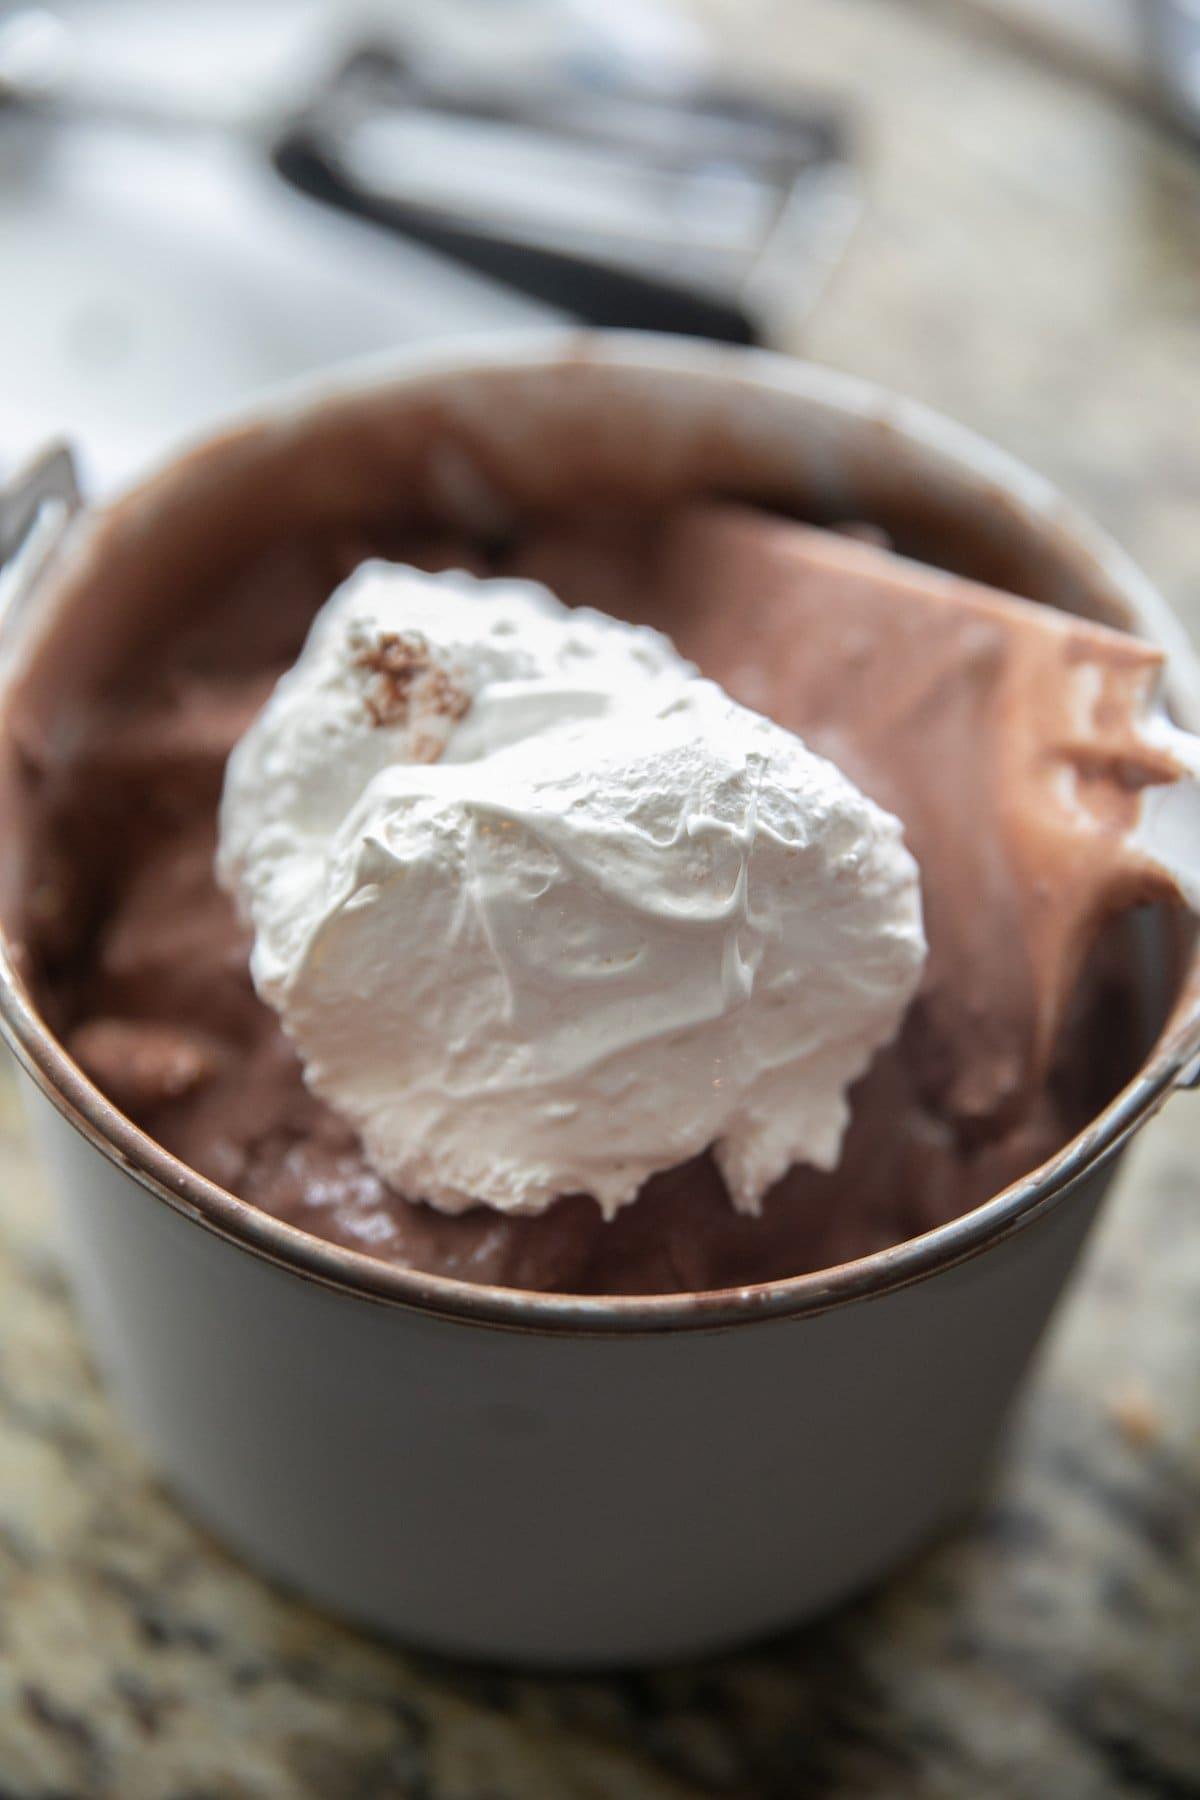 adding marshmallow fluff to freshly churned ice cream